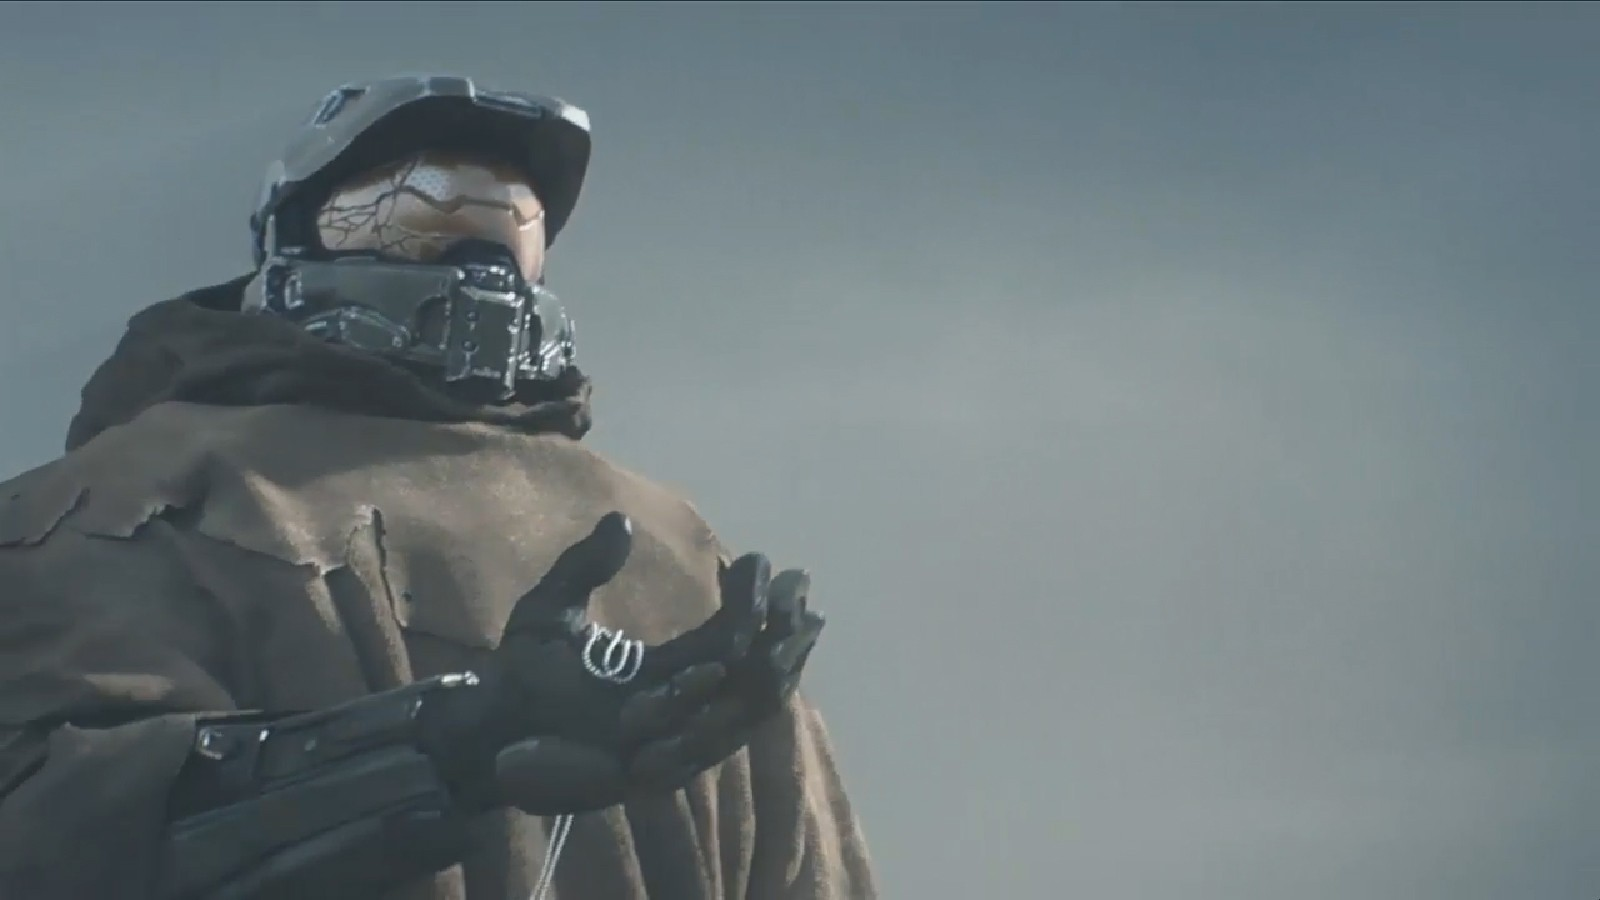 Halo 5 Guardians Video Game 21 Hd Wallpaper   Hivewallpapercom 1600x900